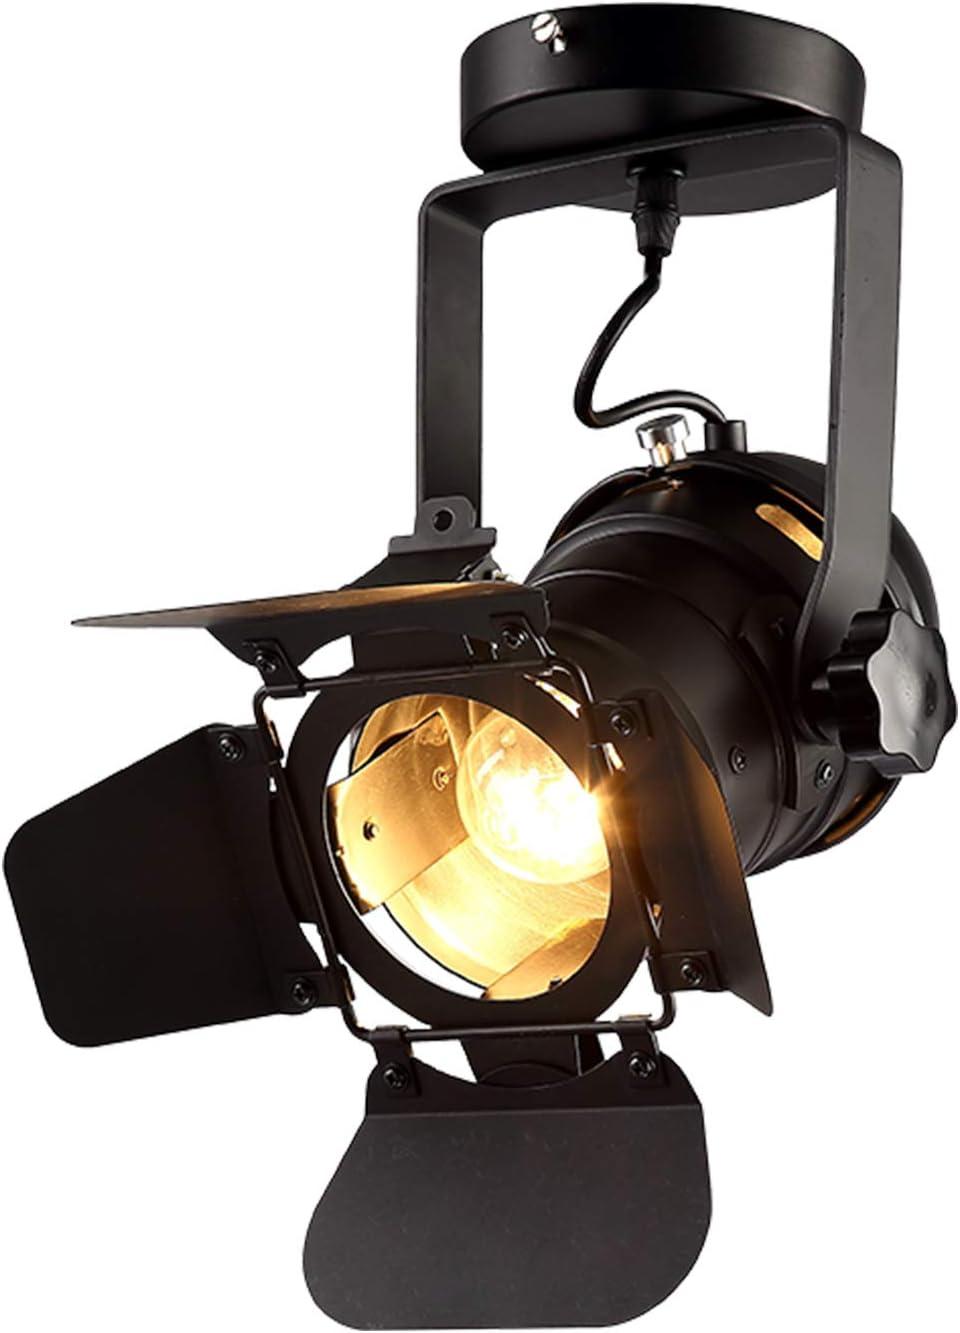 Hobaca E26 L31 W17 H35cm Loft Vintage Industrial Iron Mount Spotlight Track Lighting Ceiling Shop Light Fixtures LED Pendant Lights Ceiling Lights for Home Lighting